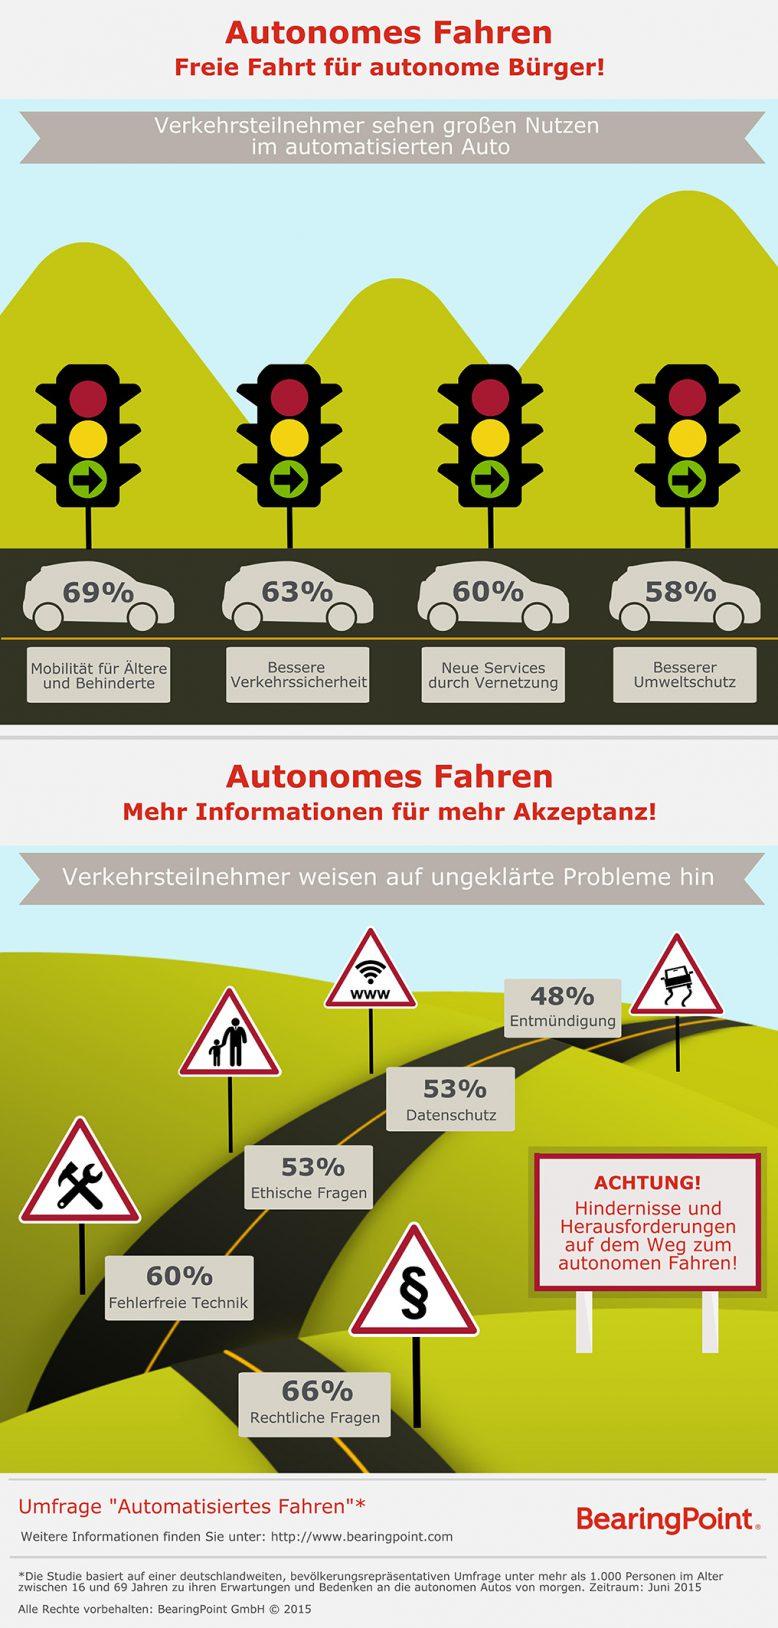 bearingpoint_autonomes_fahren_grafik1